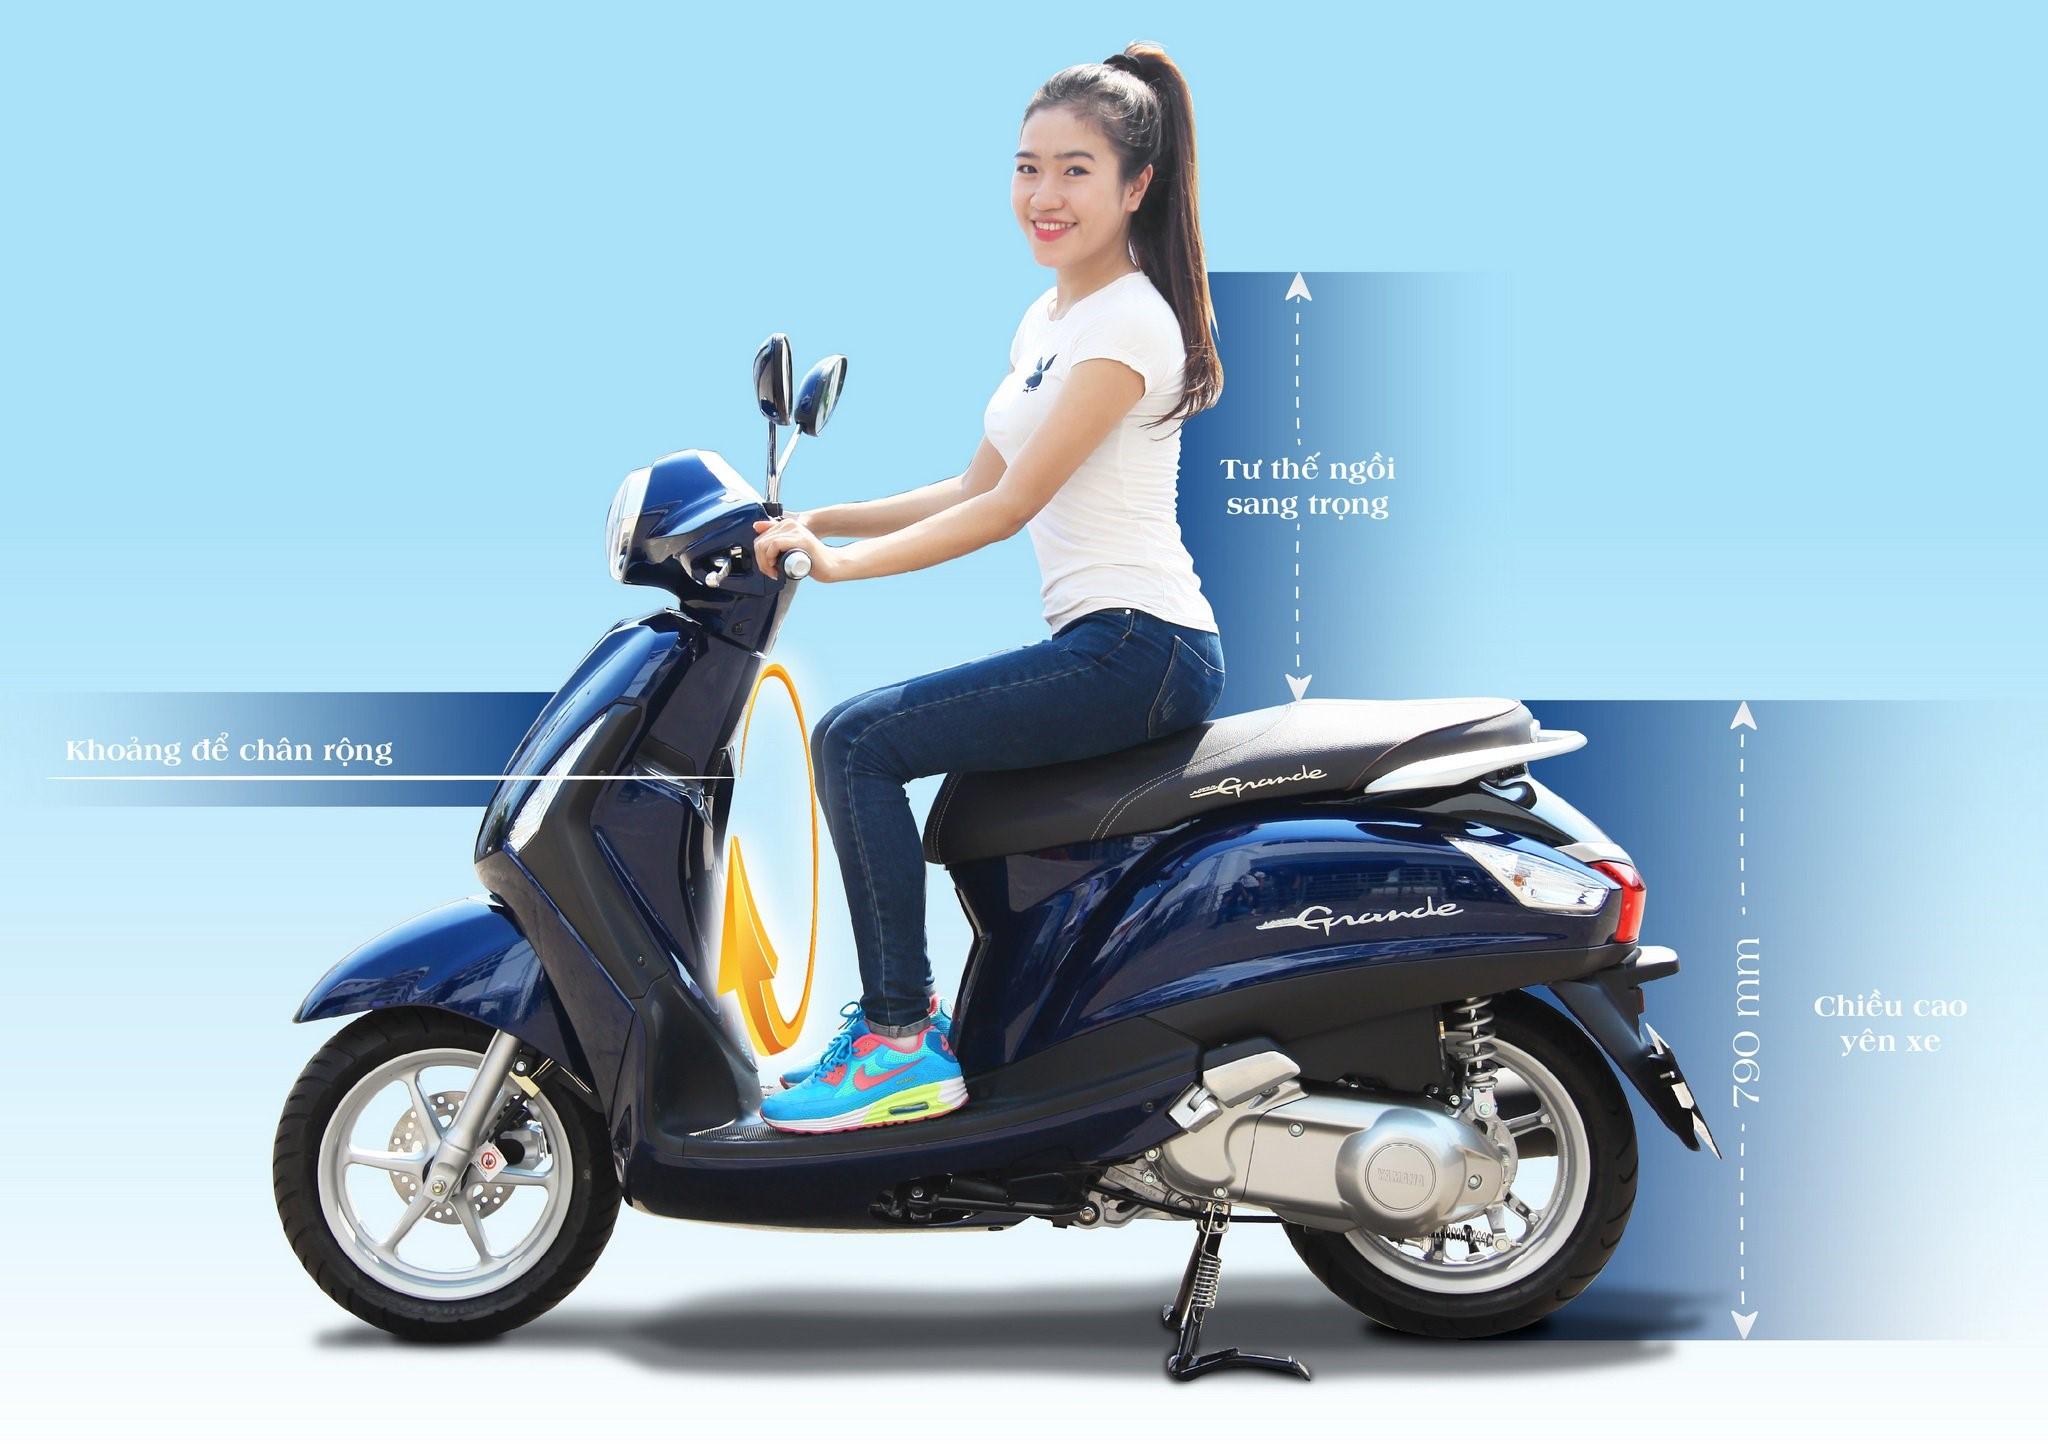 Image result for Tư thế lái xe máy an toàn